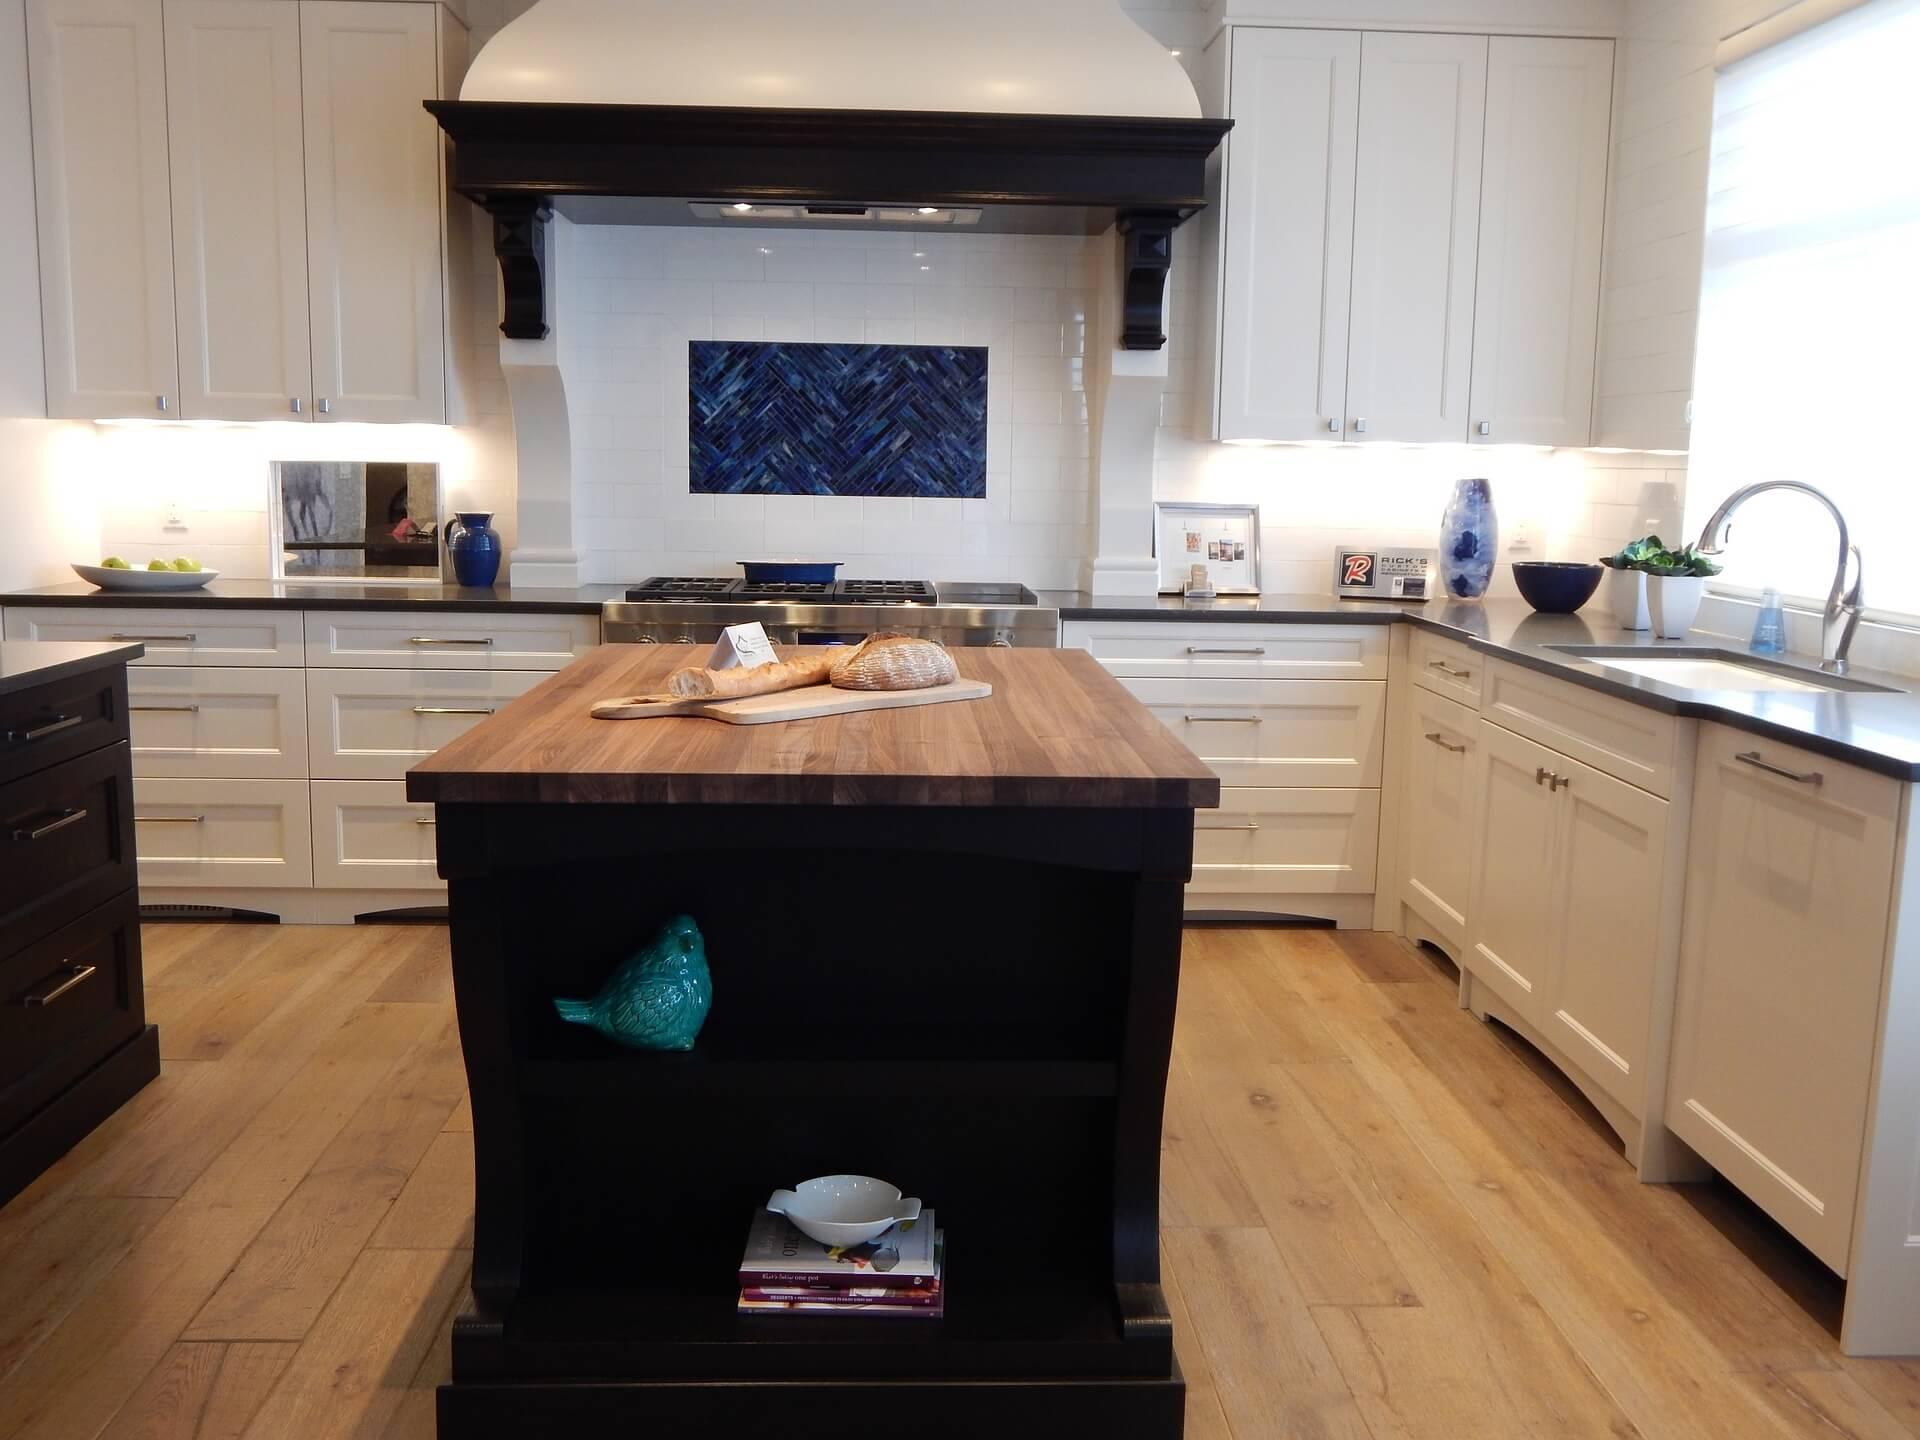 Kookeiland kleine ruimte fabulous kleine keuken met tafel with